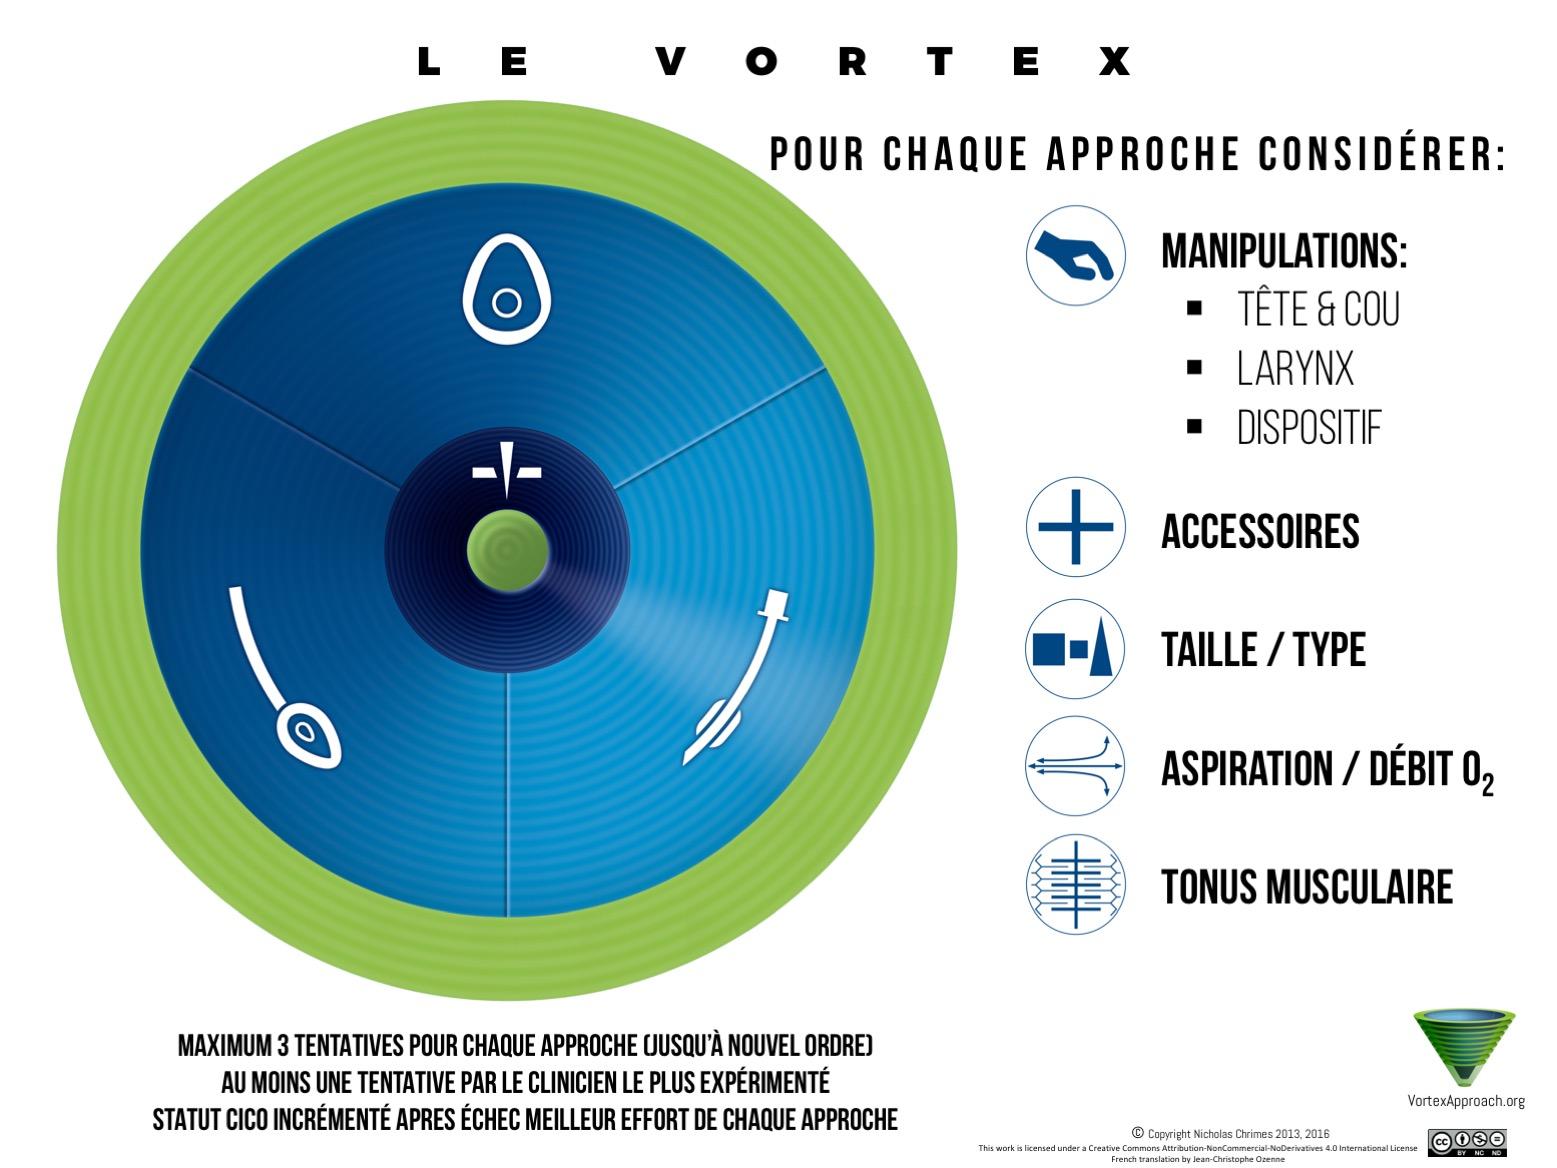 Vortex Implementation Tool - French Version